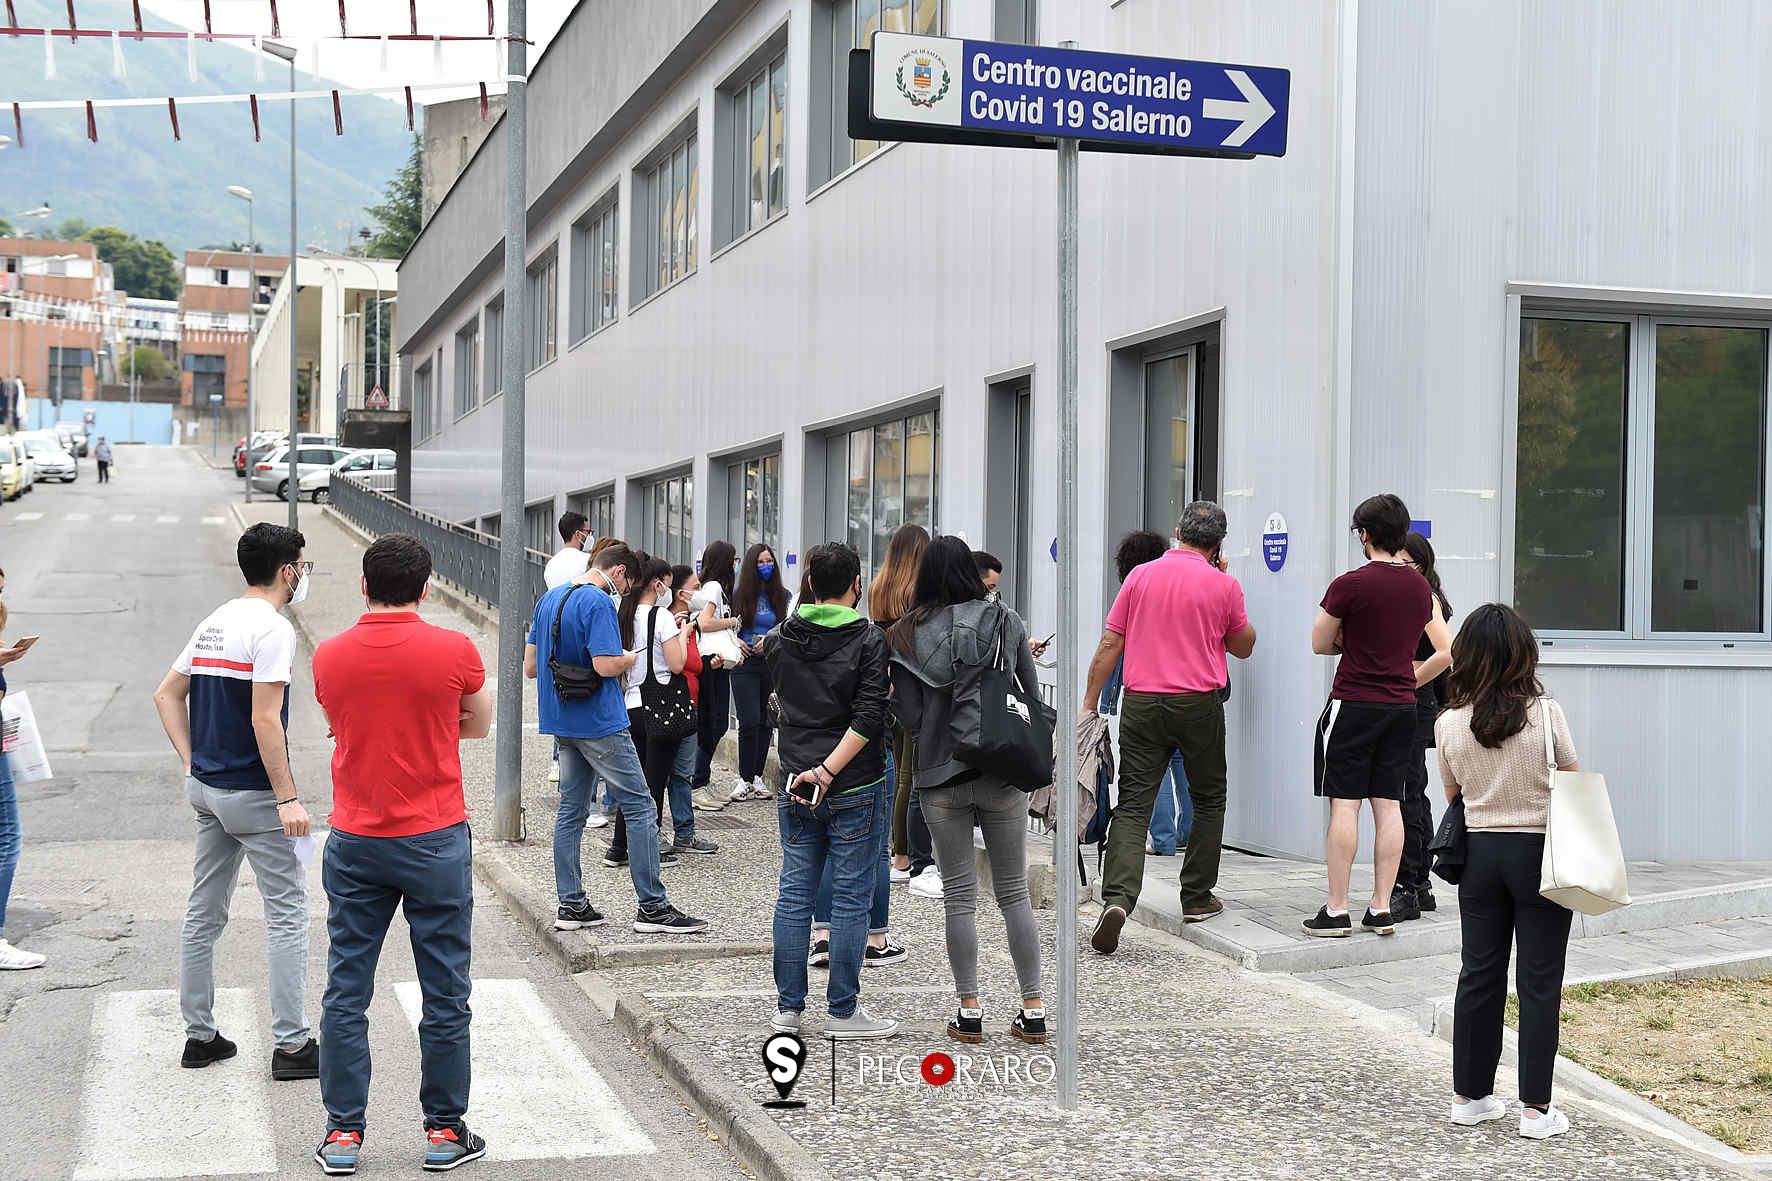 SAL - 05 06 2021 Matierno Centro Vaccinale. Open Day. Foto Tanopress